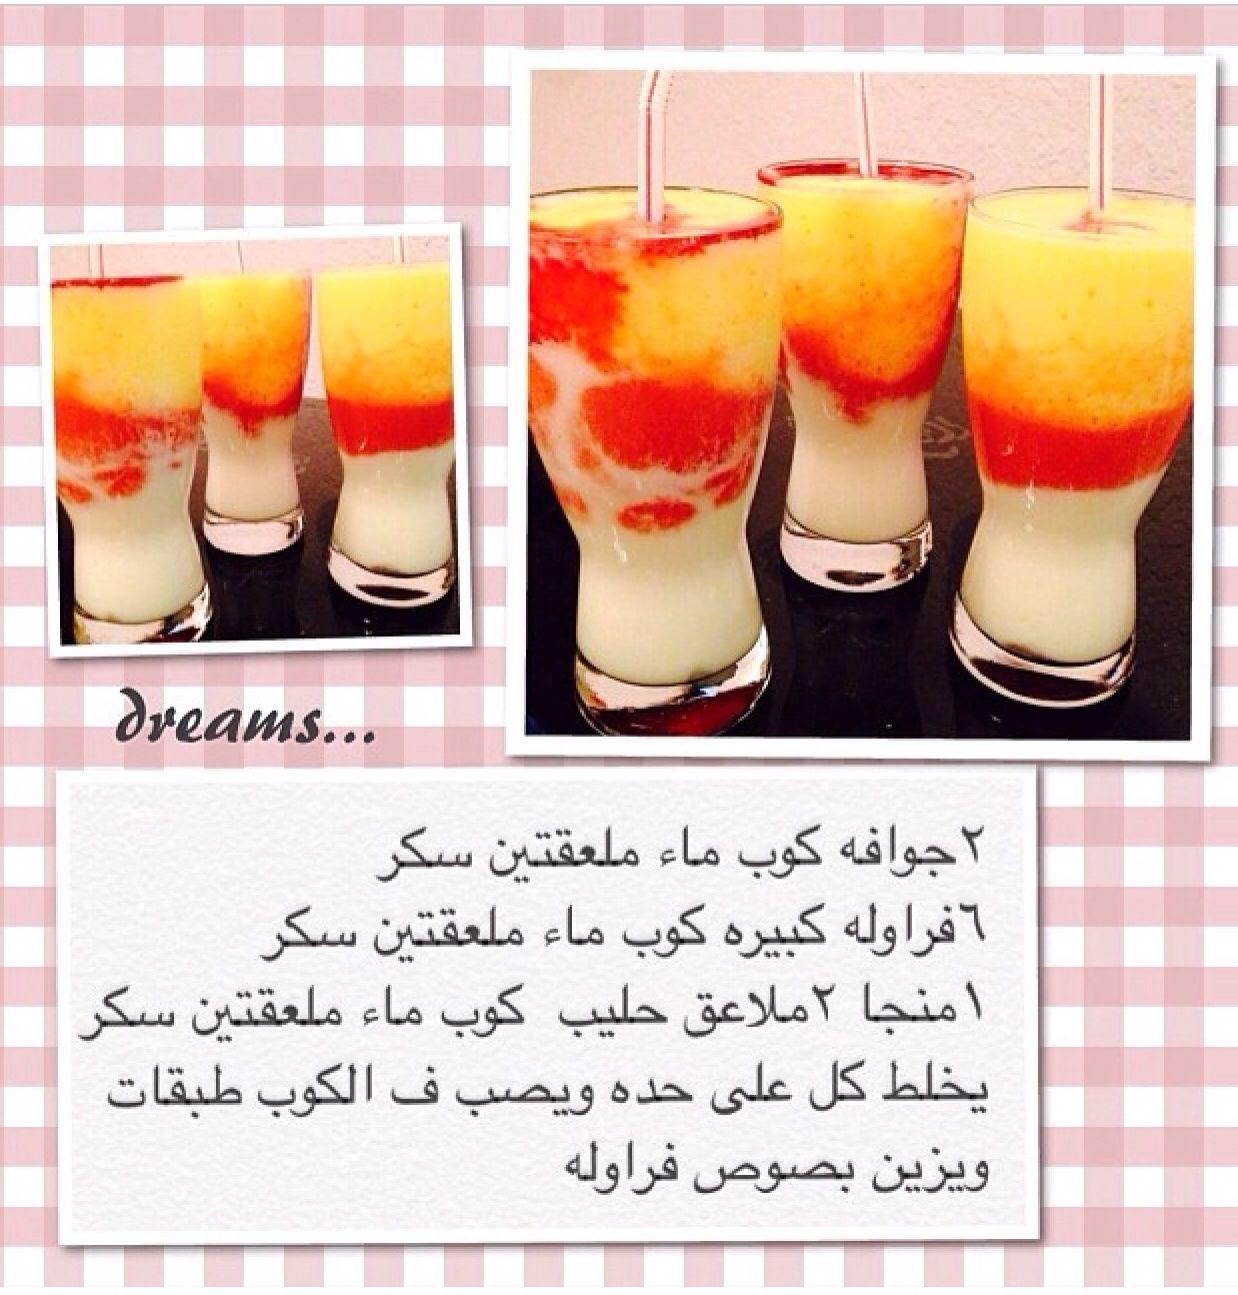 عصير كوكتيل Fresh Drinks Smoothie Recipes Healthy Arabic Food